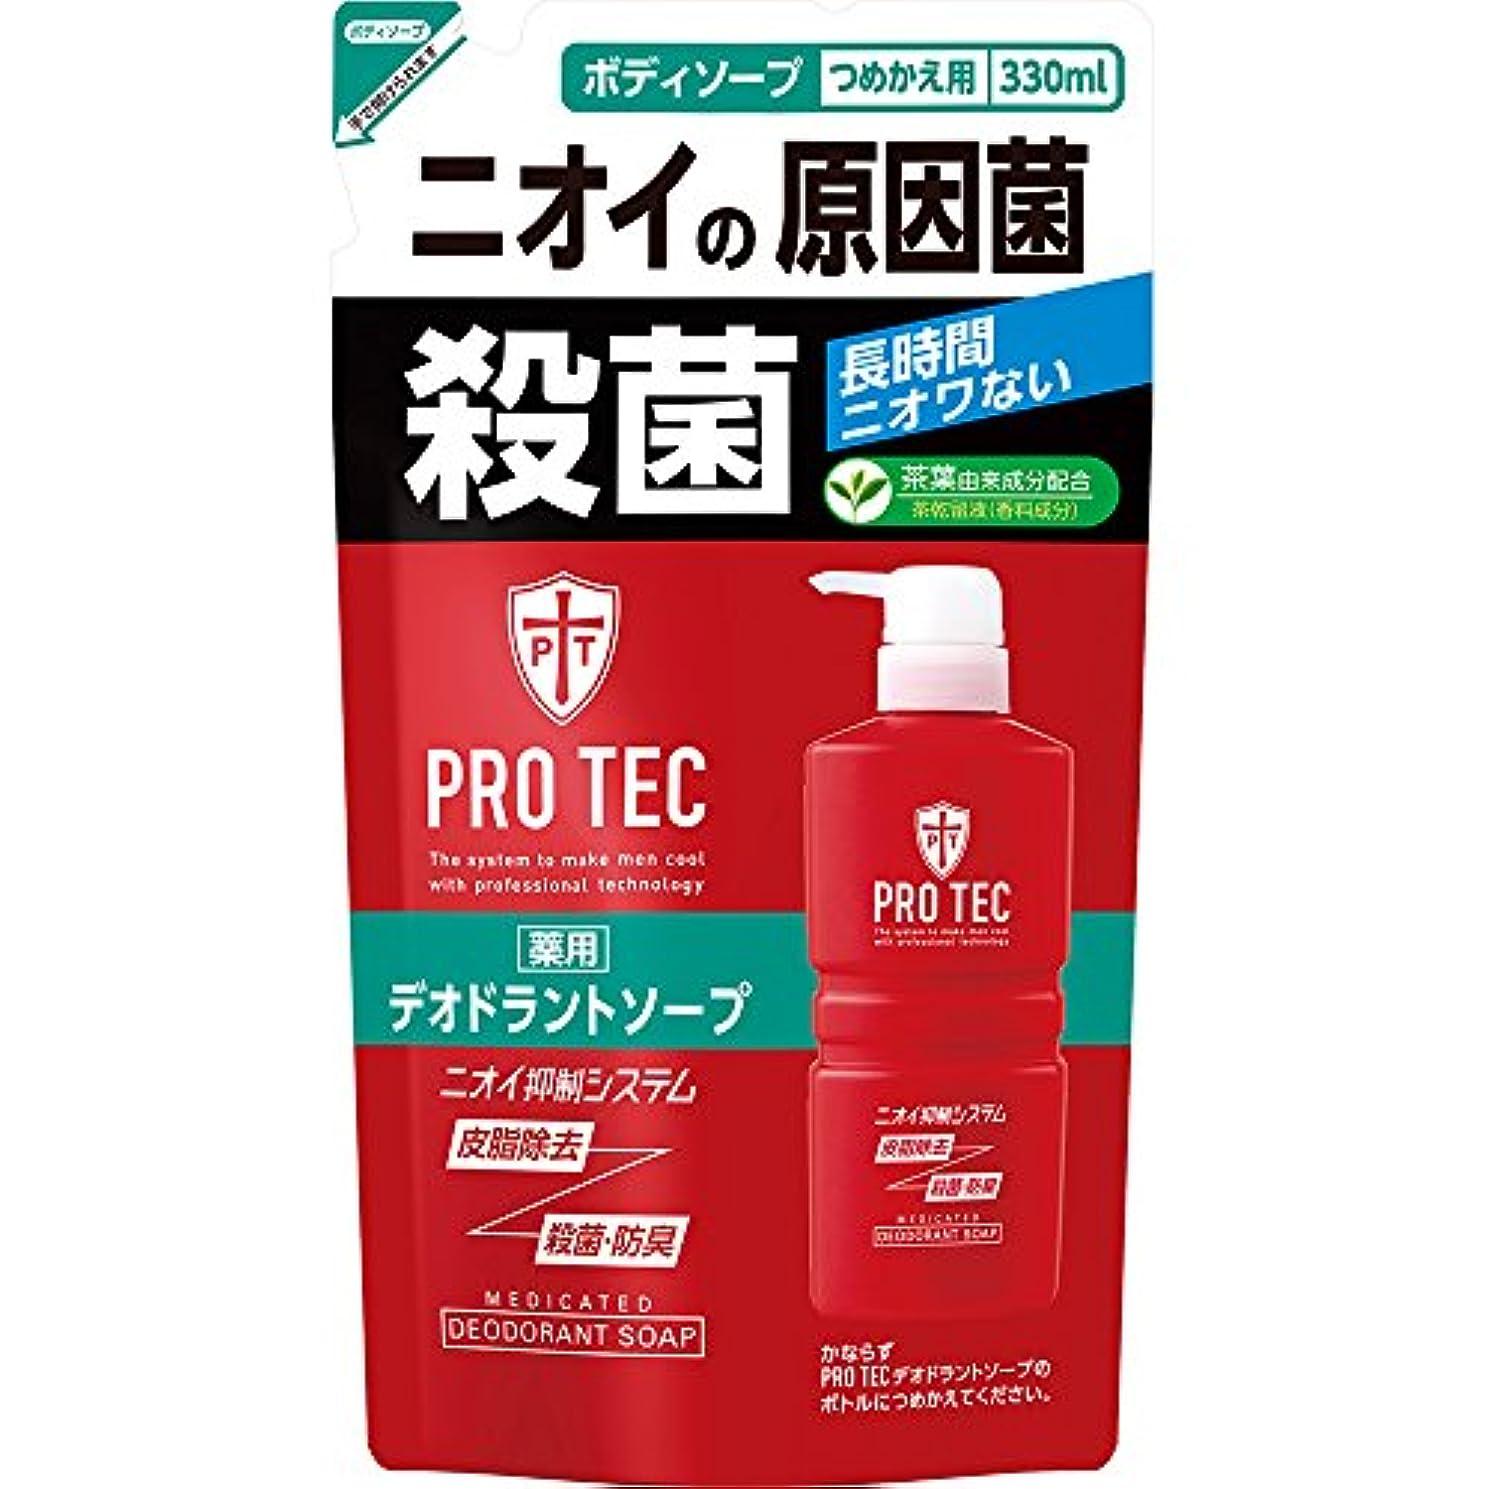 PRO TEC(プロテク) デオドラントソープ 詰め替え 330ml(医薬部外品)